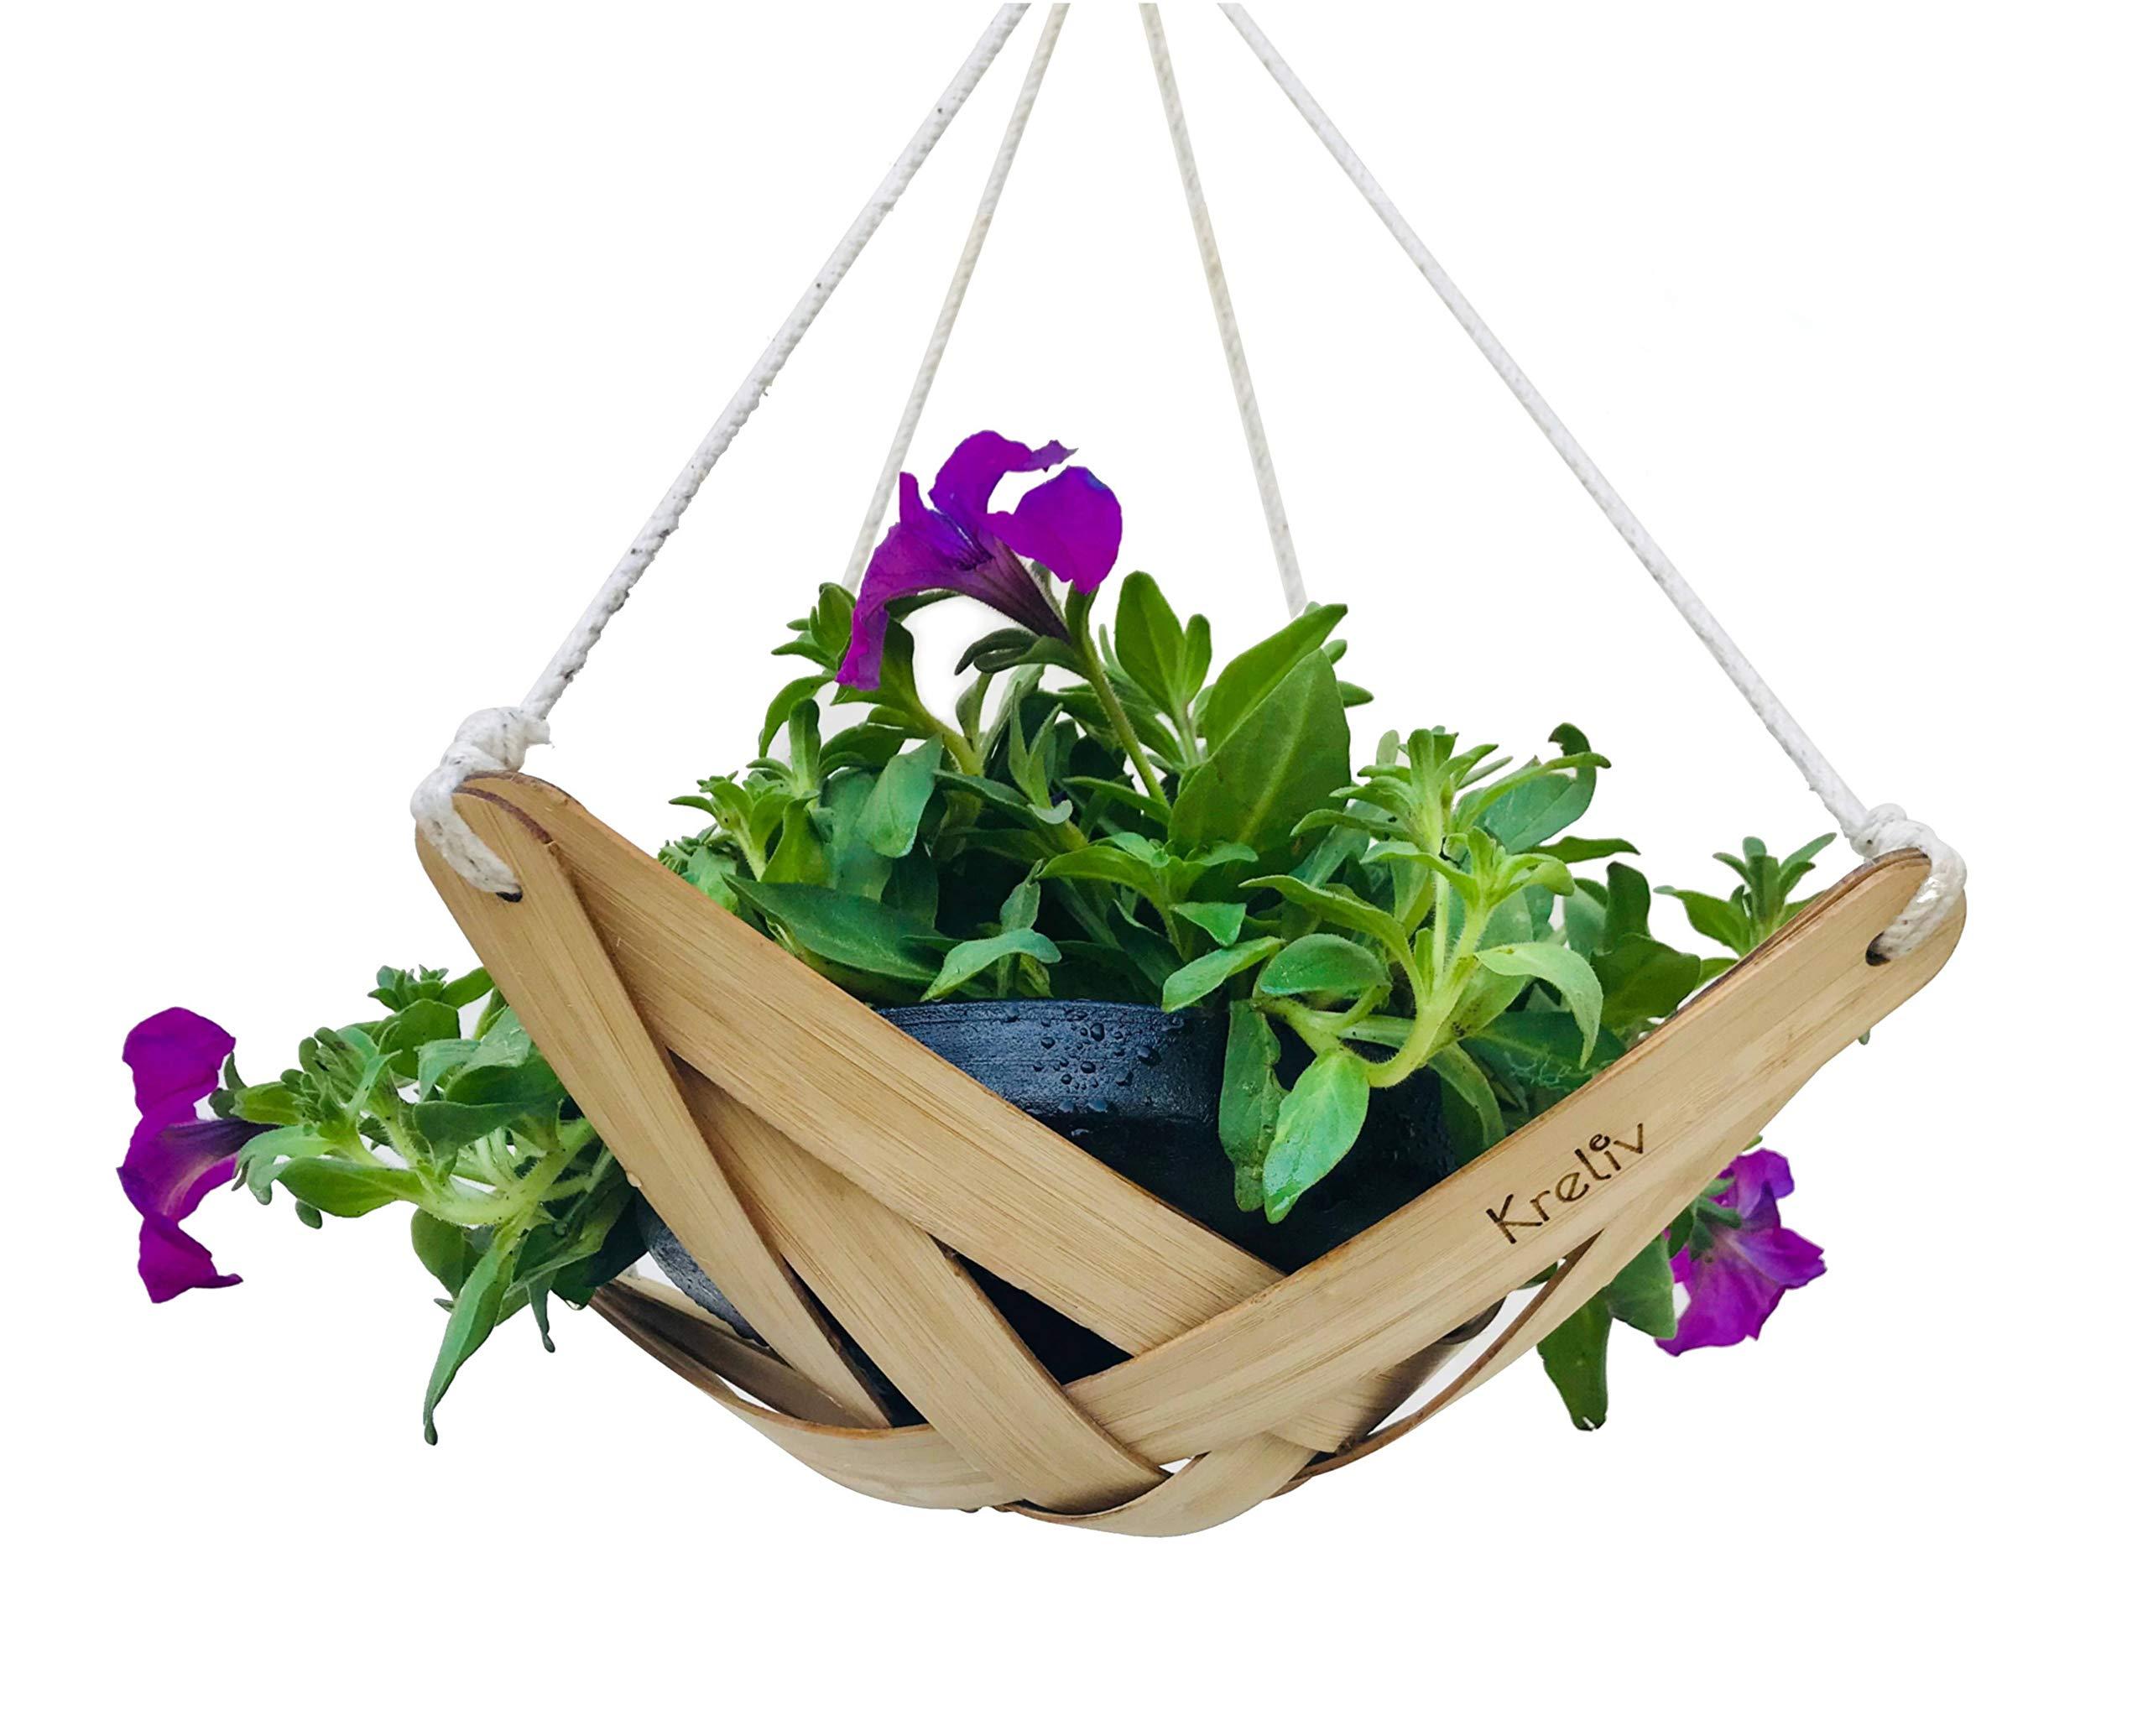 Kreliv Bamboo Terracotta Hanging Planter - Medium product image